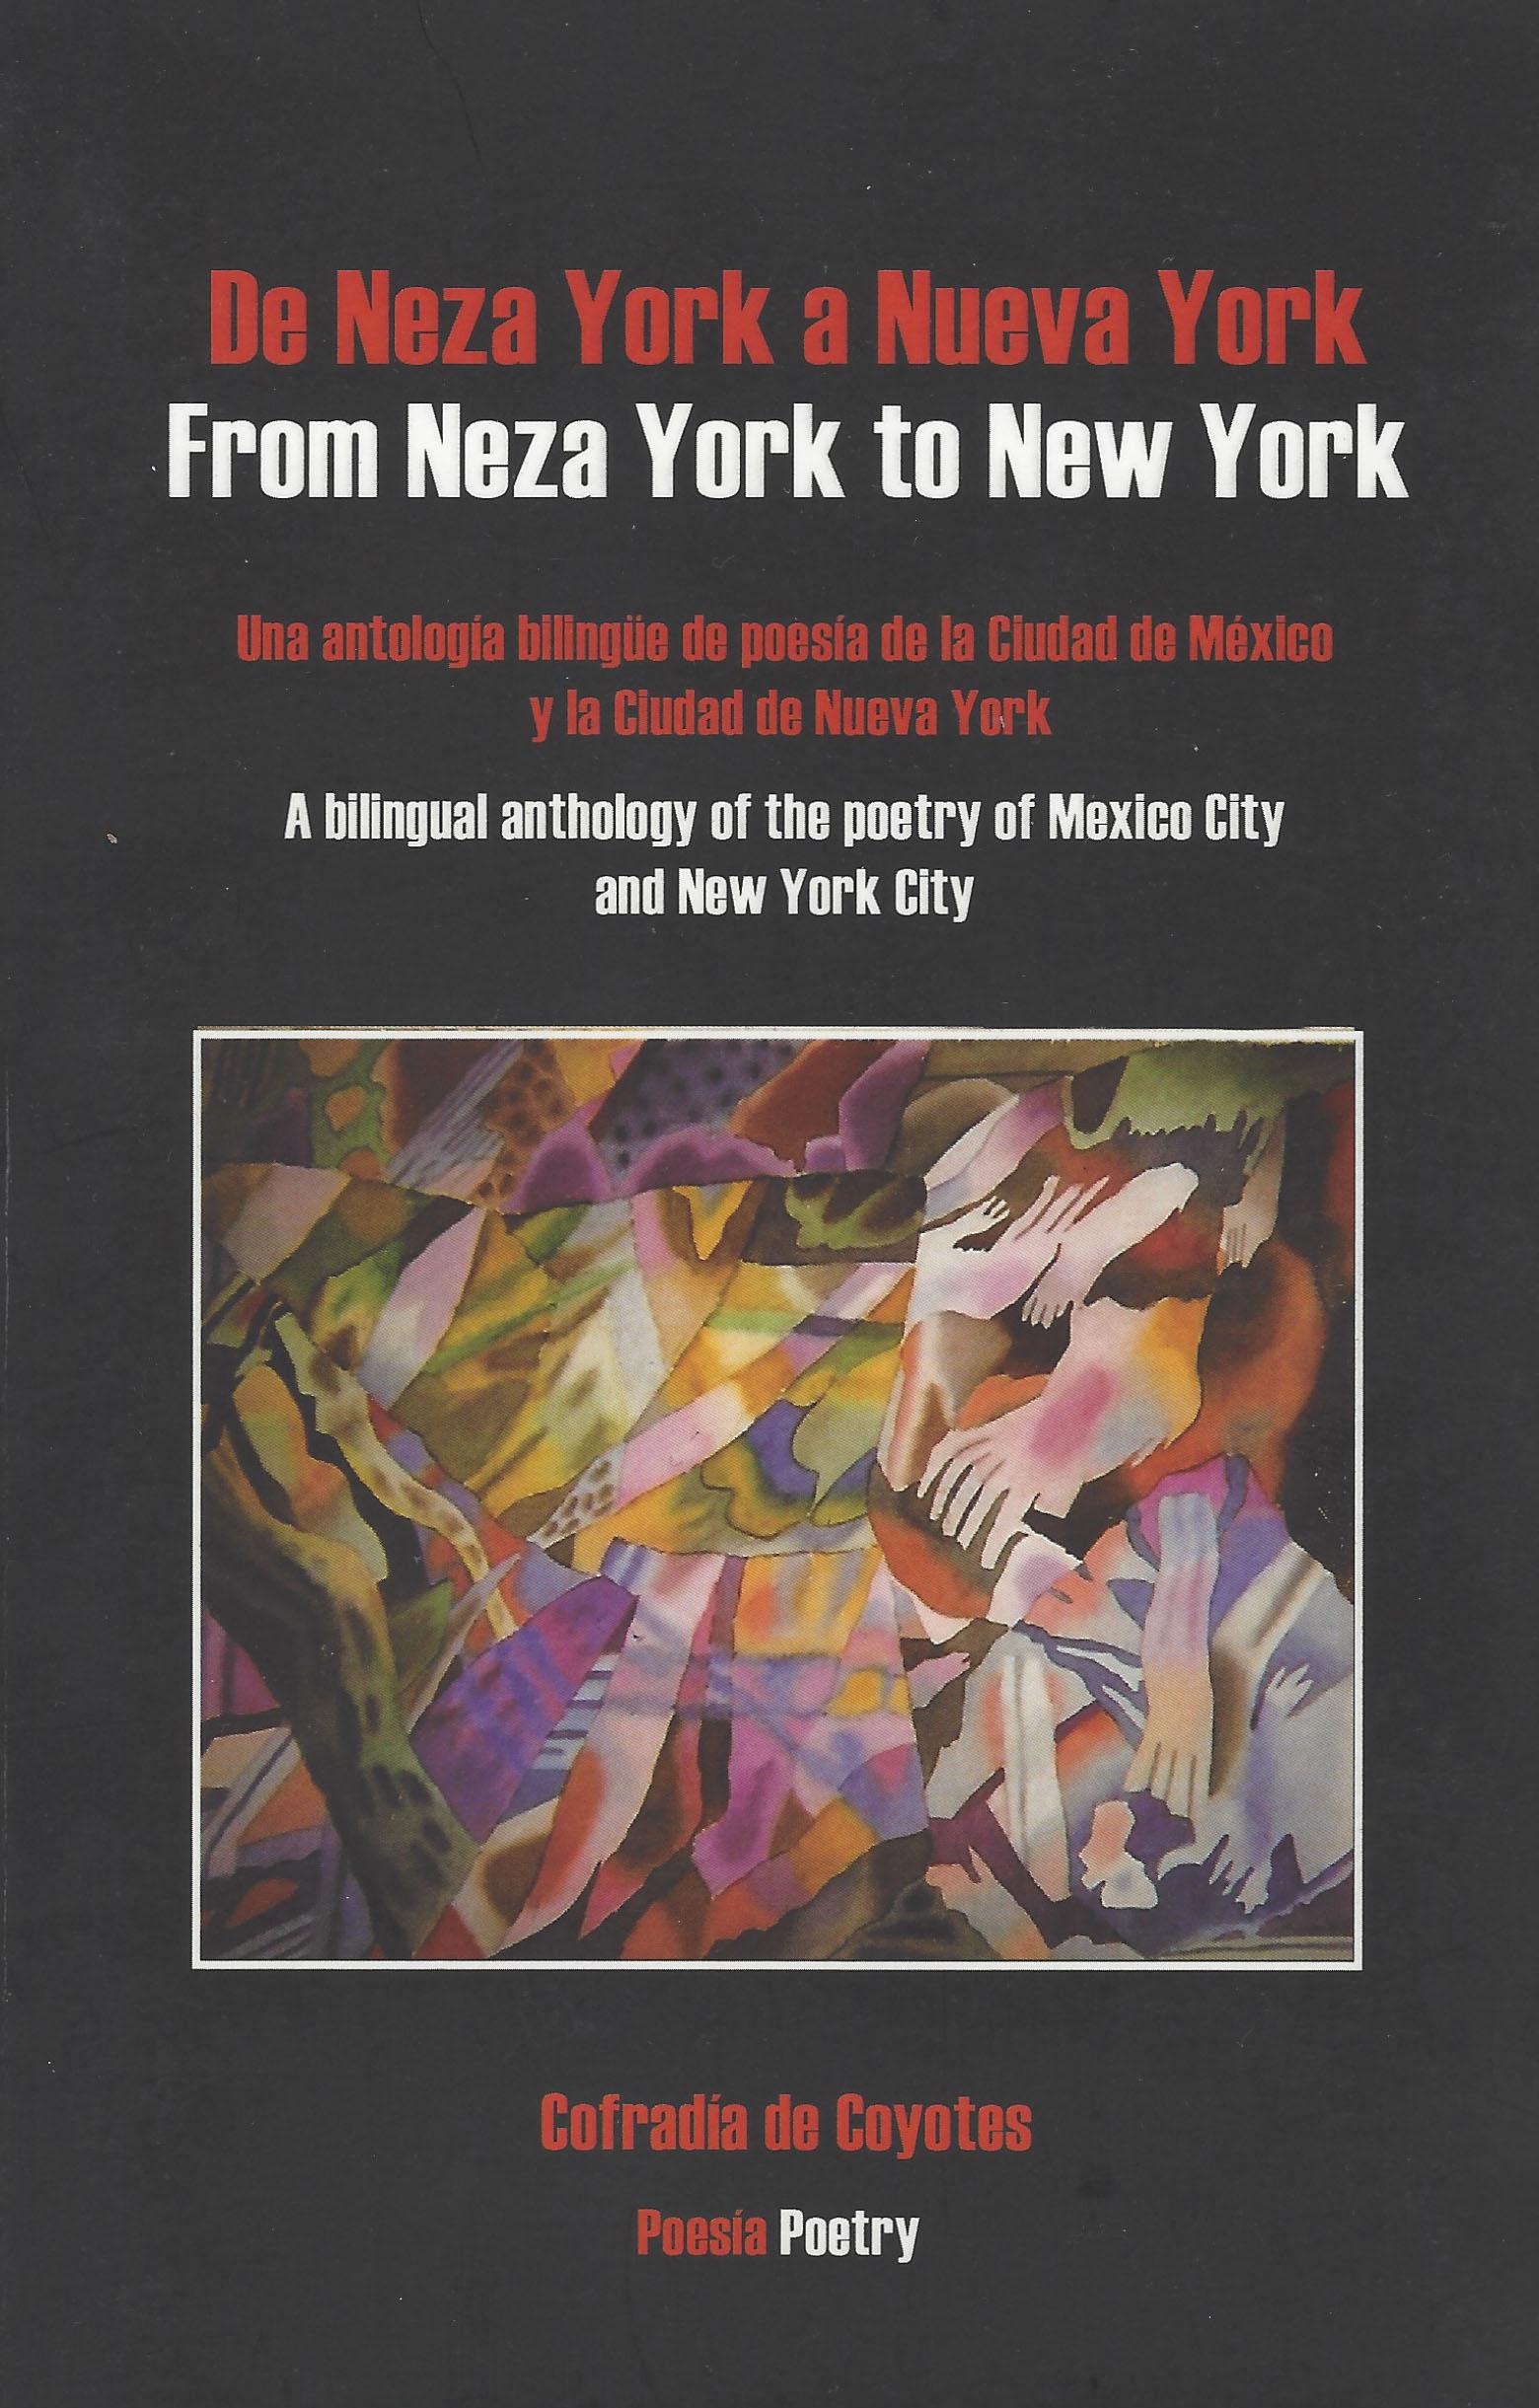 De Neza York a Nueva York